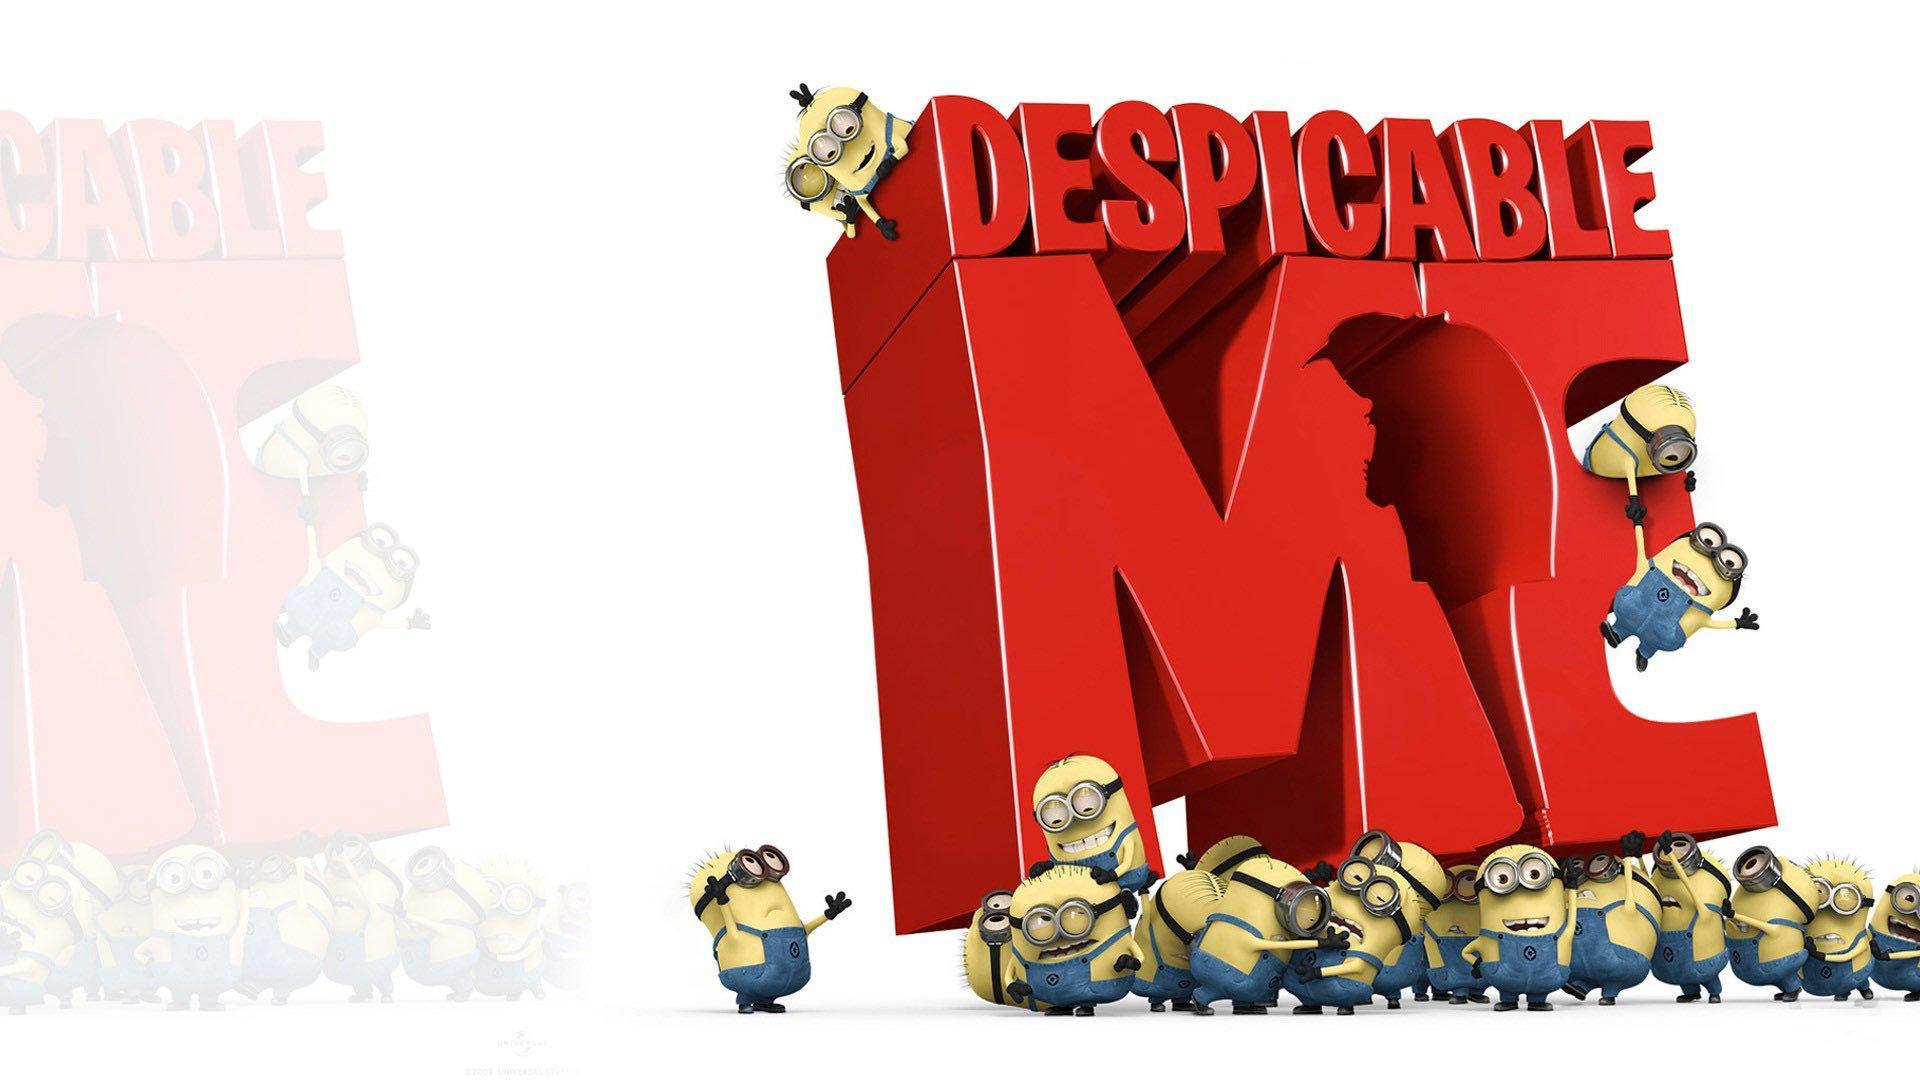 Despicable Me Minions - Despicable Me Soundtrack - HD Wallpaper